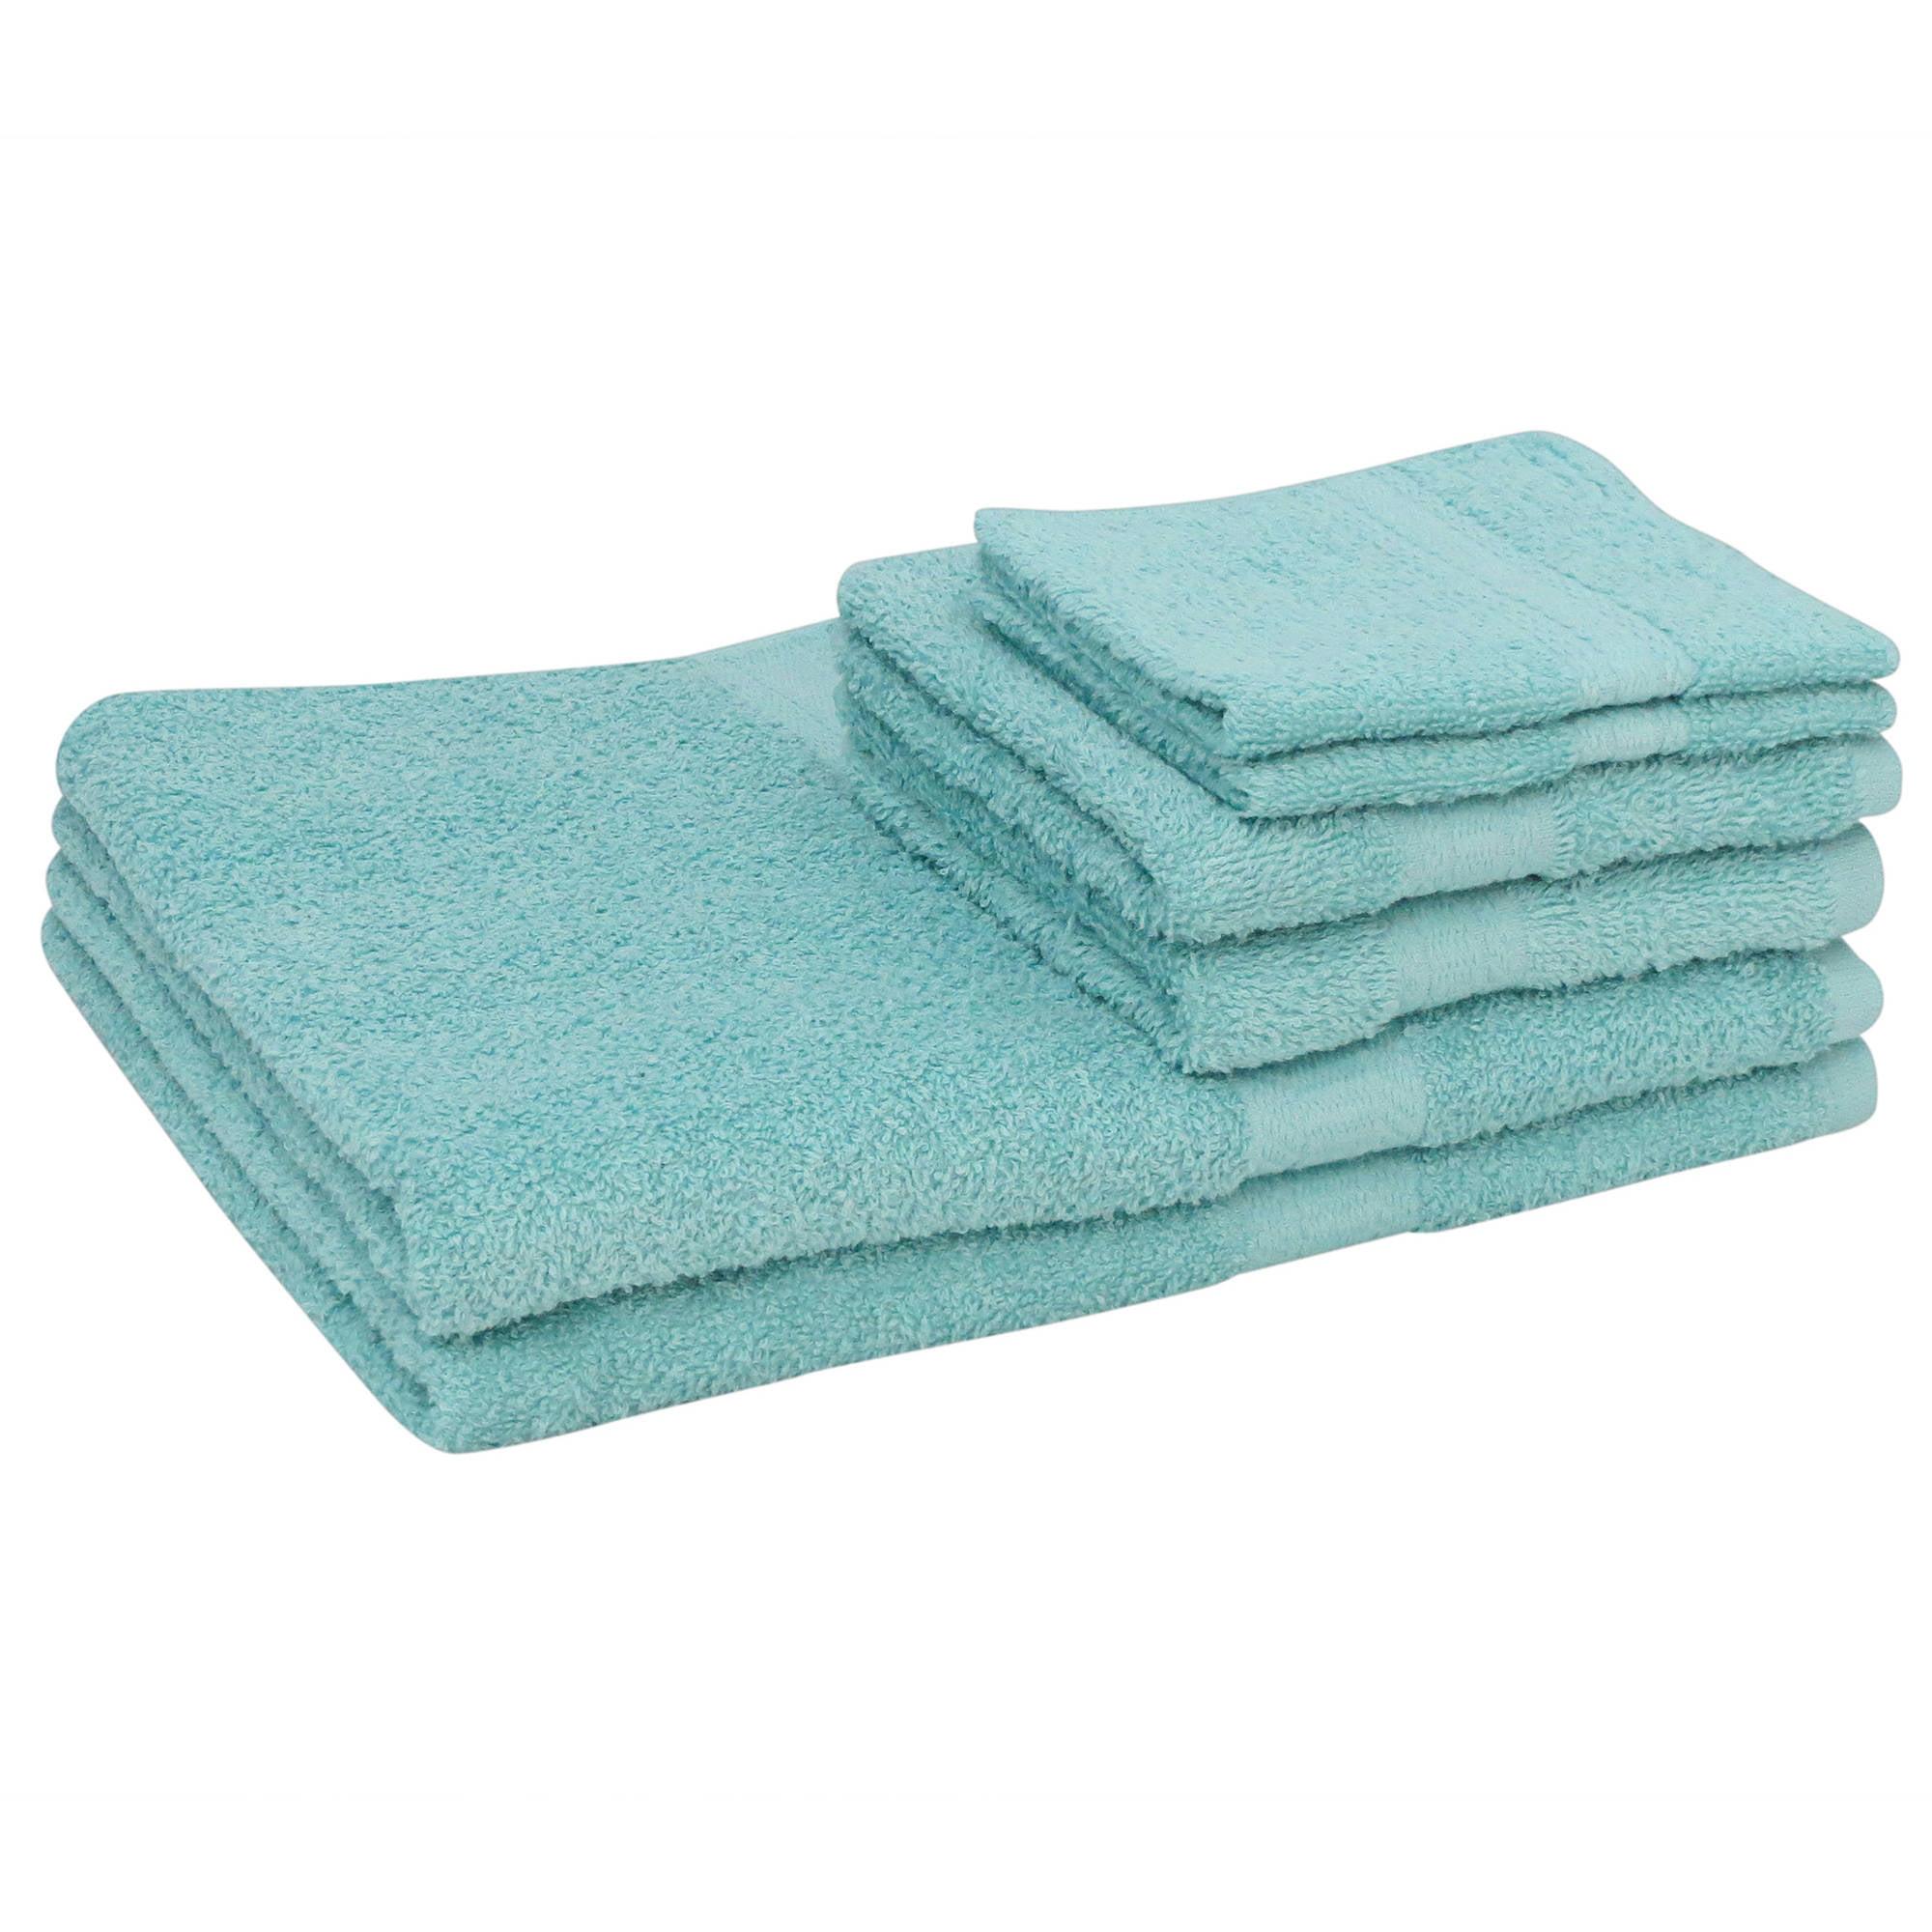 Mainstays Basic Cotton Bath Towel Set - 6 Piece Set ...